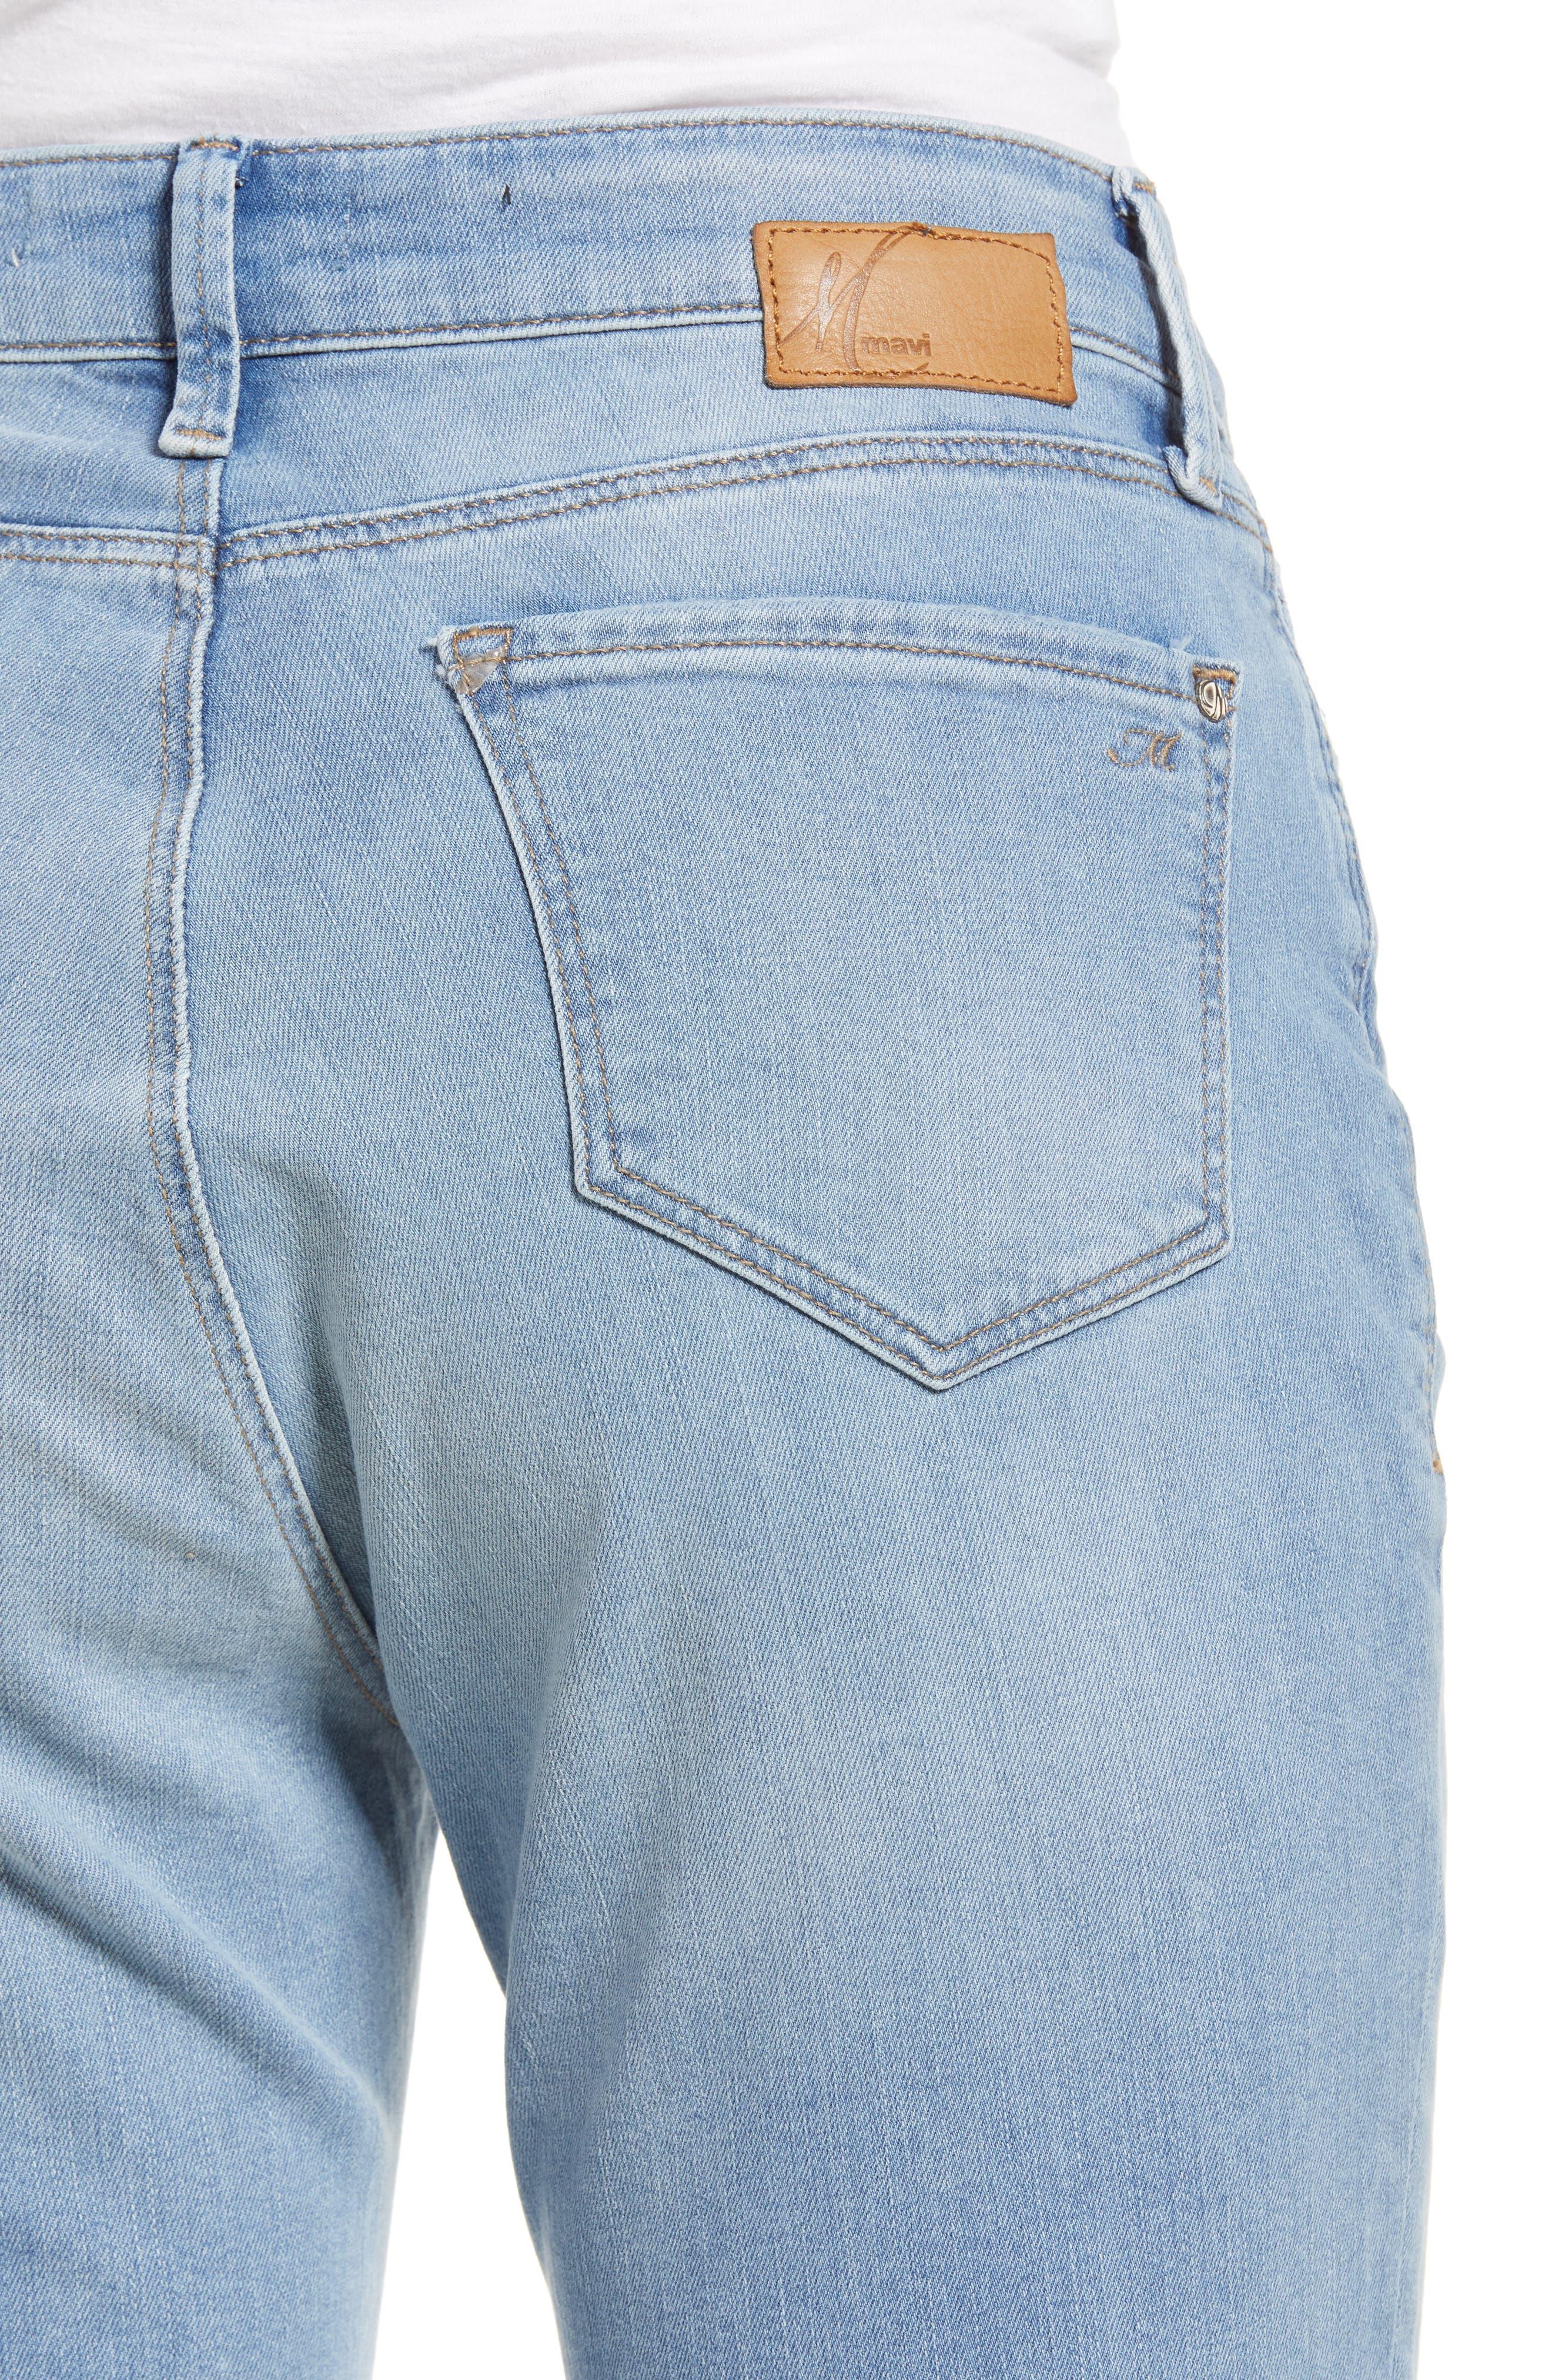 Lea Boyfriend Ripped Jeans,                             Alternate thumbnail 4, color,                             420